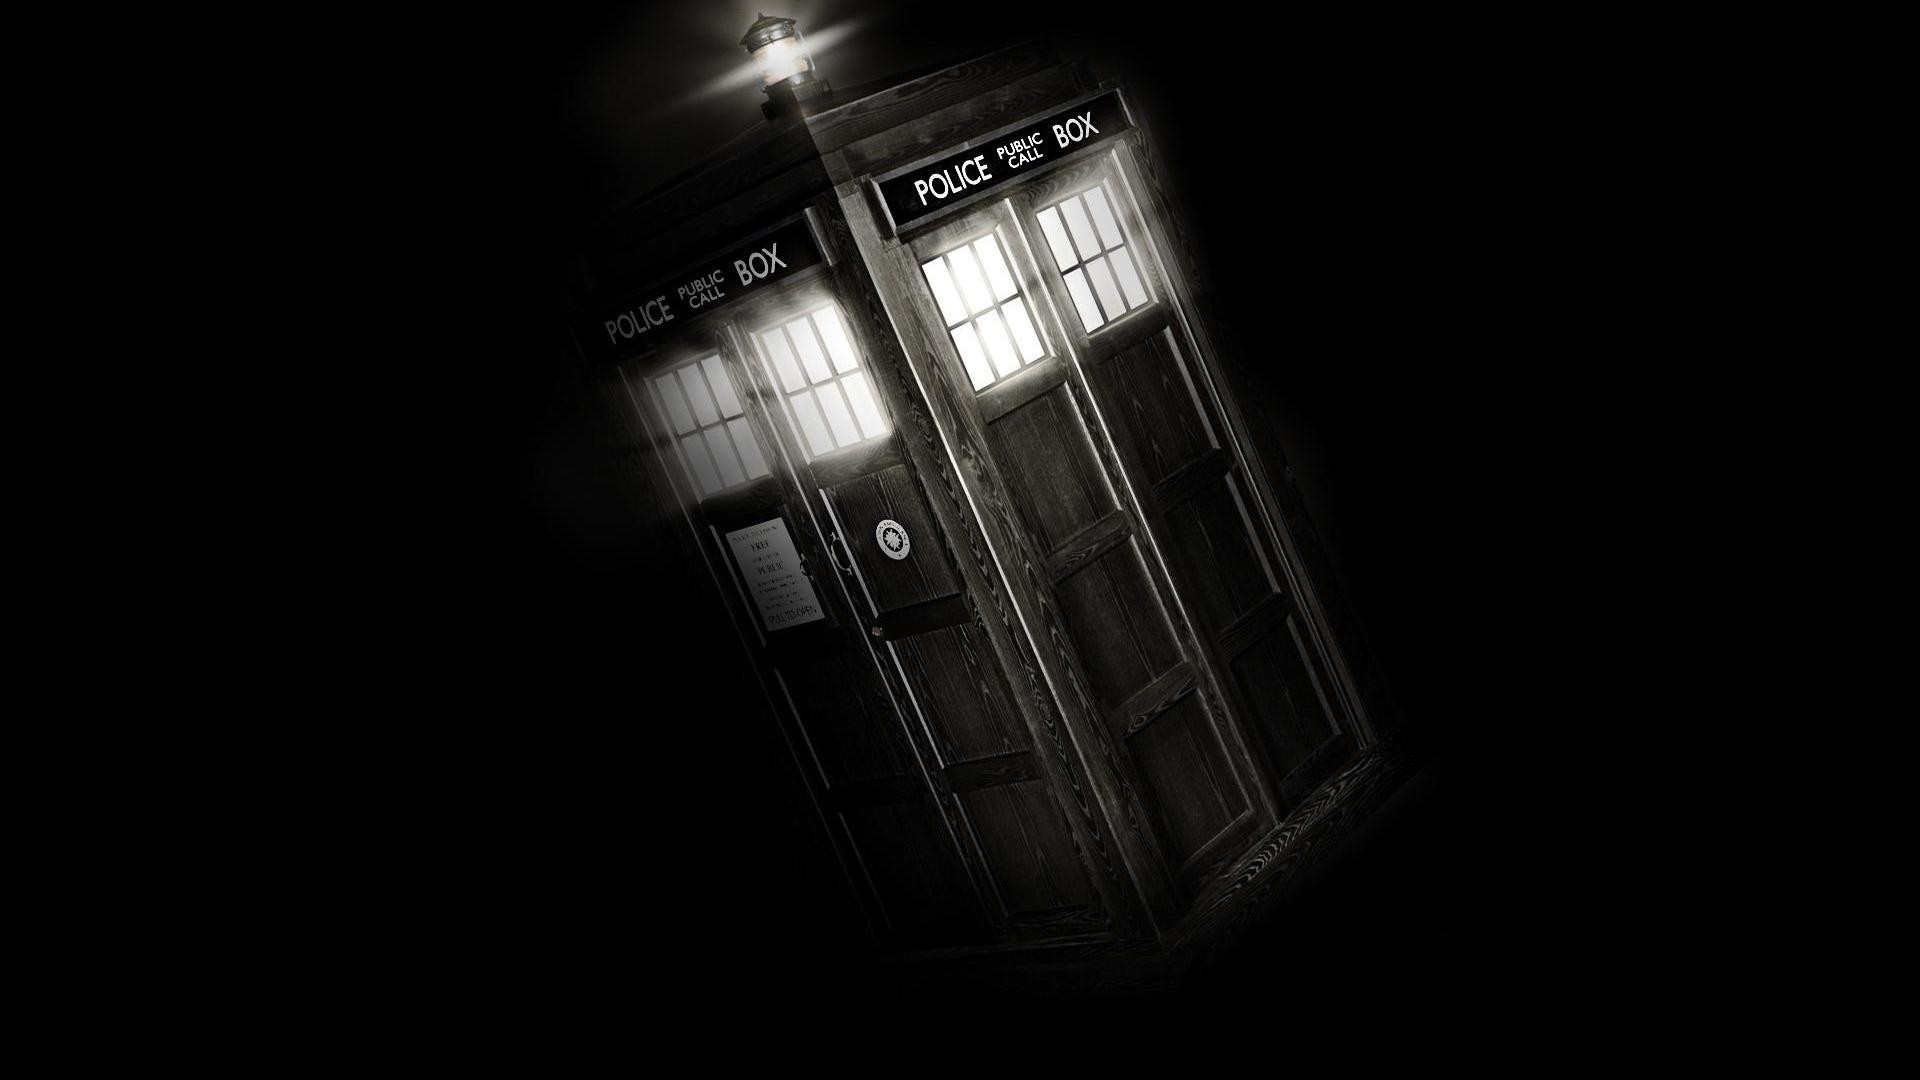 Doctor Who Desktop Wallpaper Hd: Doctor Who Desktop Wallpaper (64+ Images